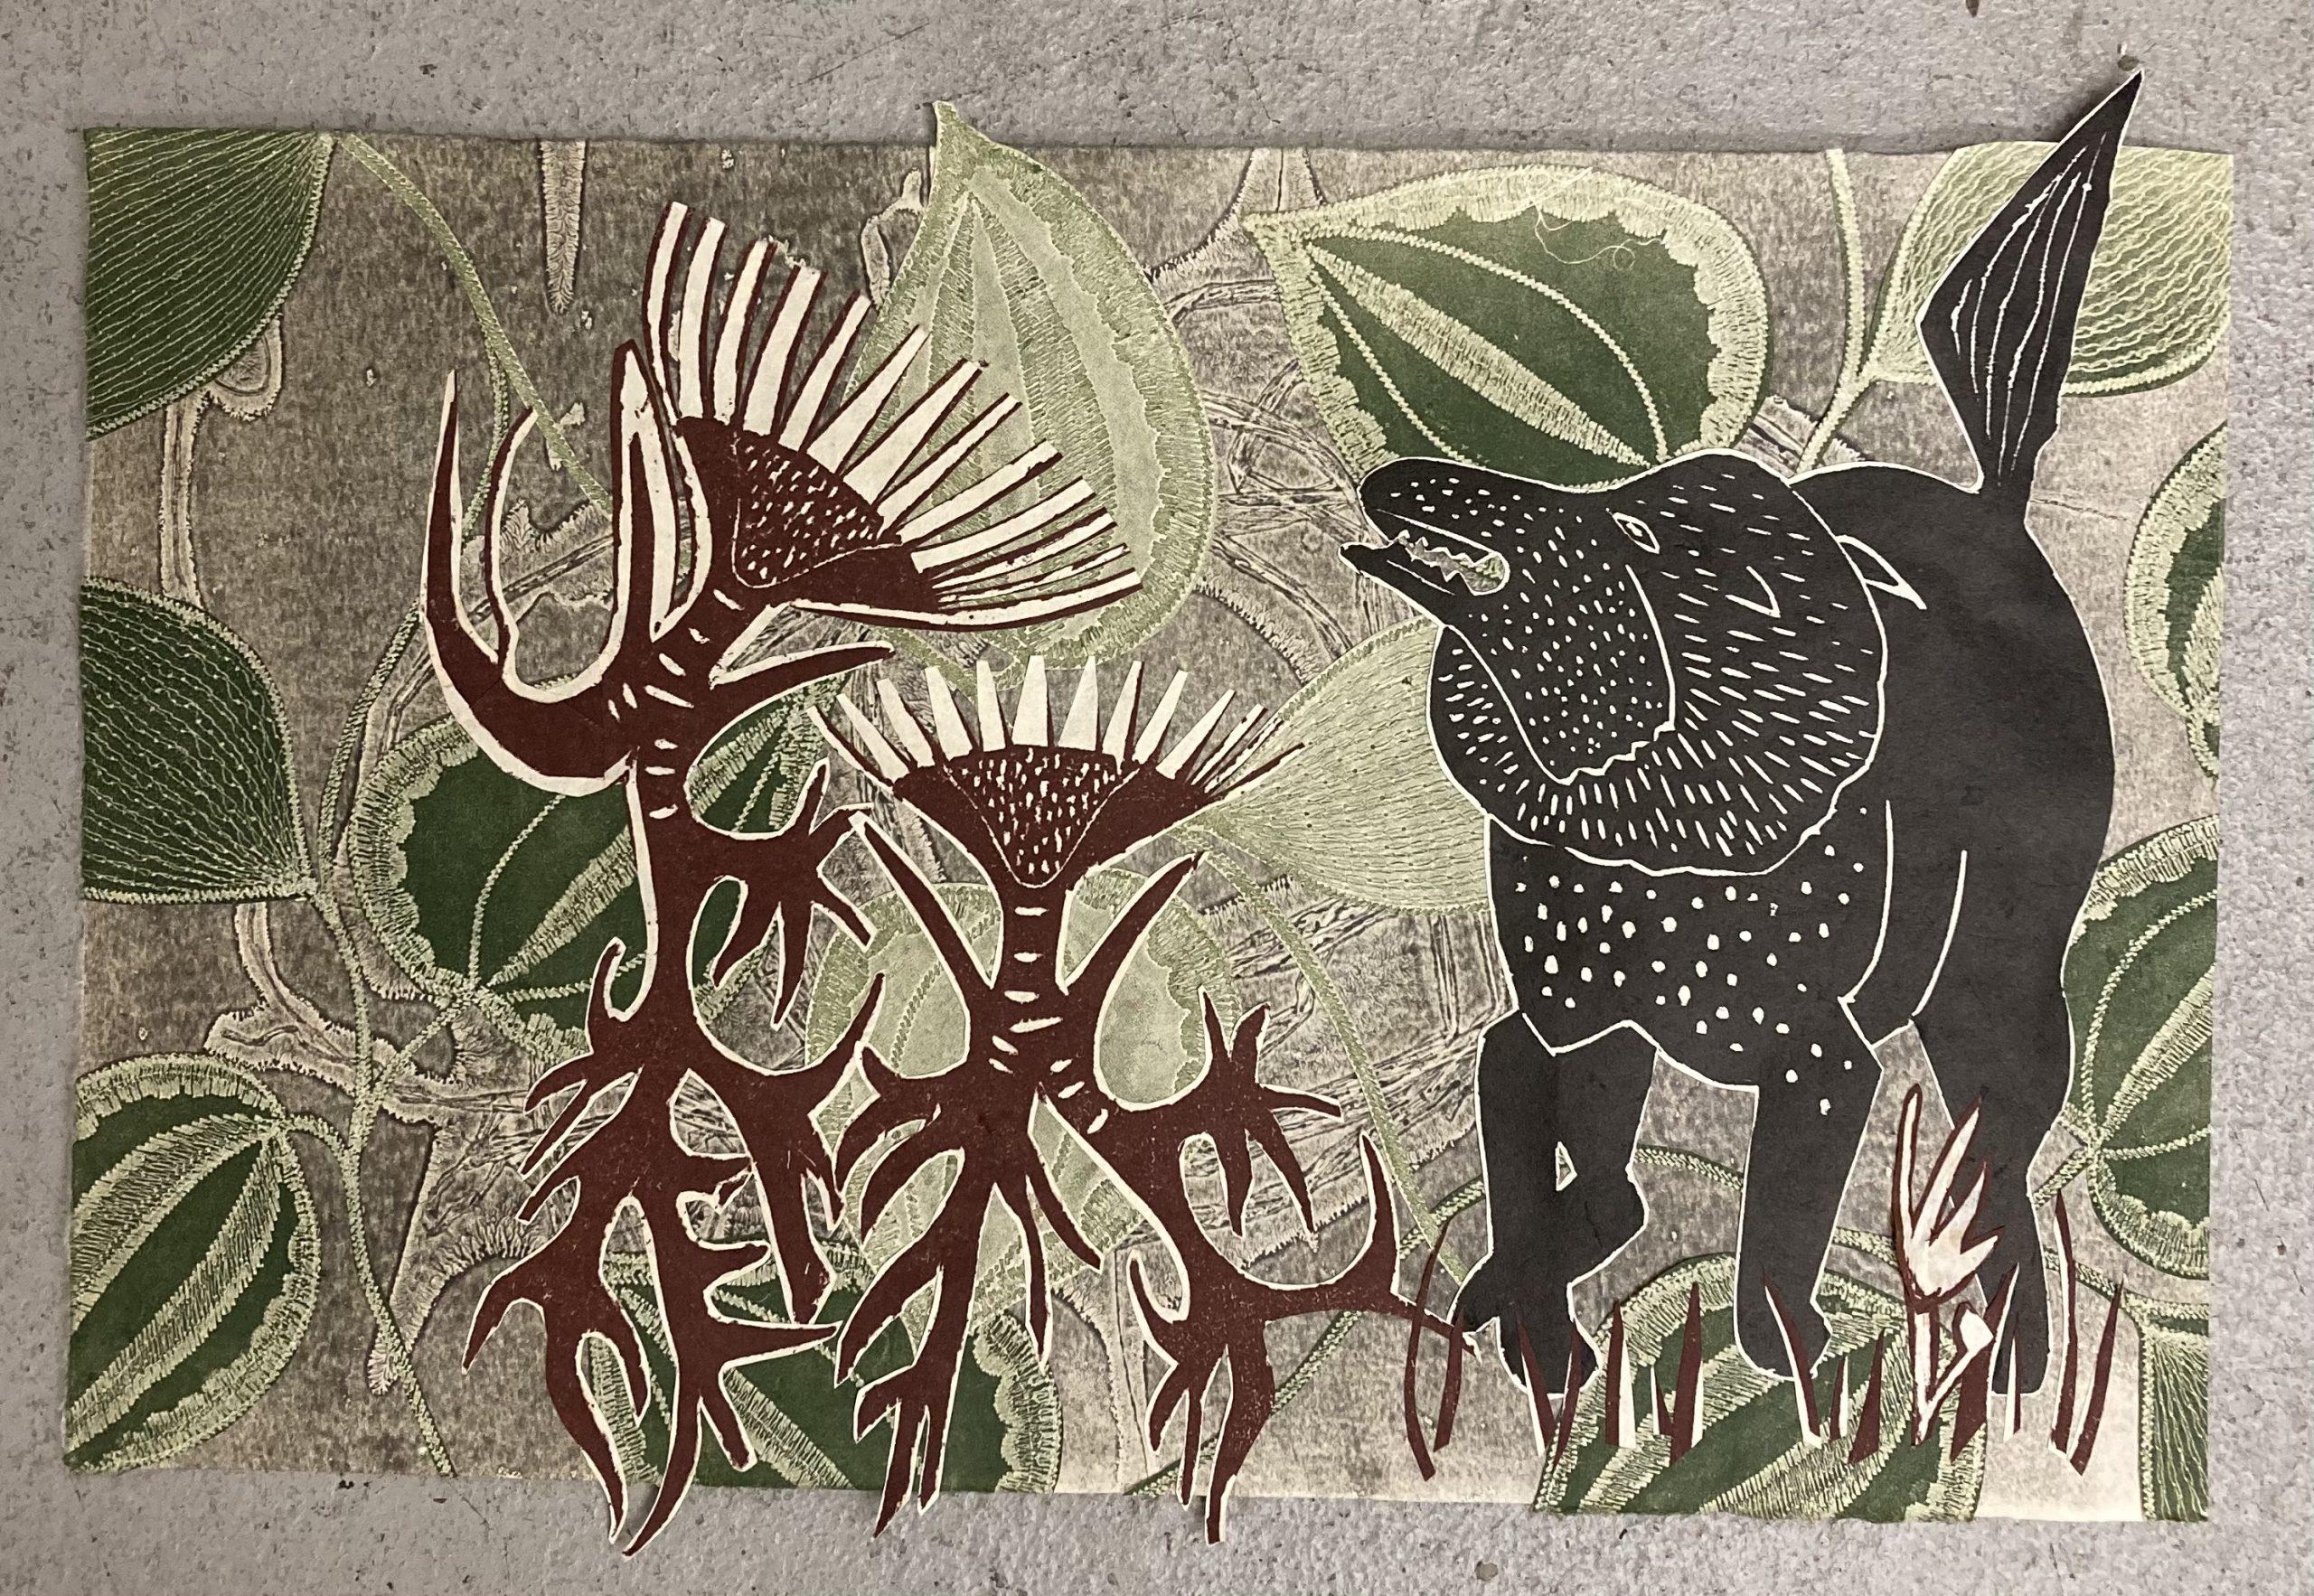 Debra Olin  -  In Garden  -  monoprint, woodcut, collage  -  NFS